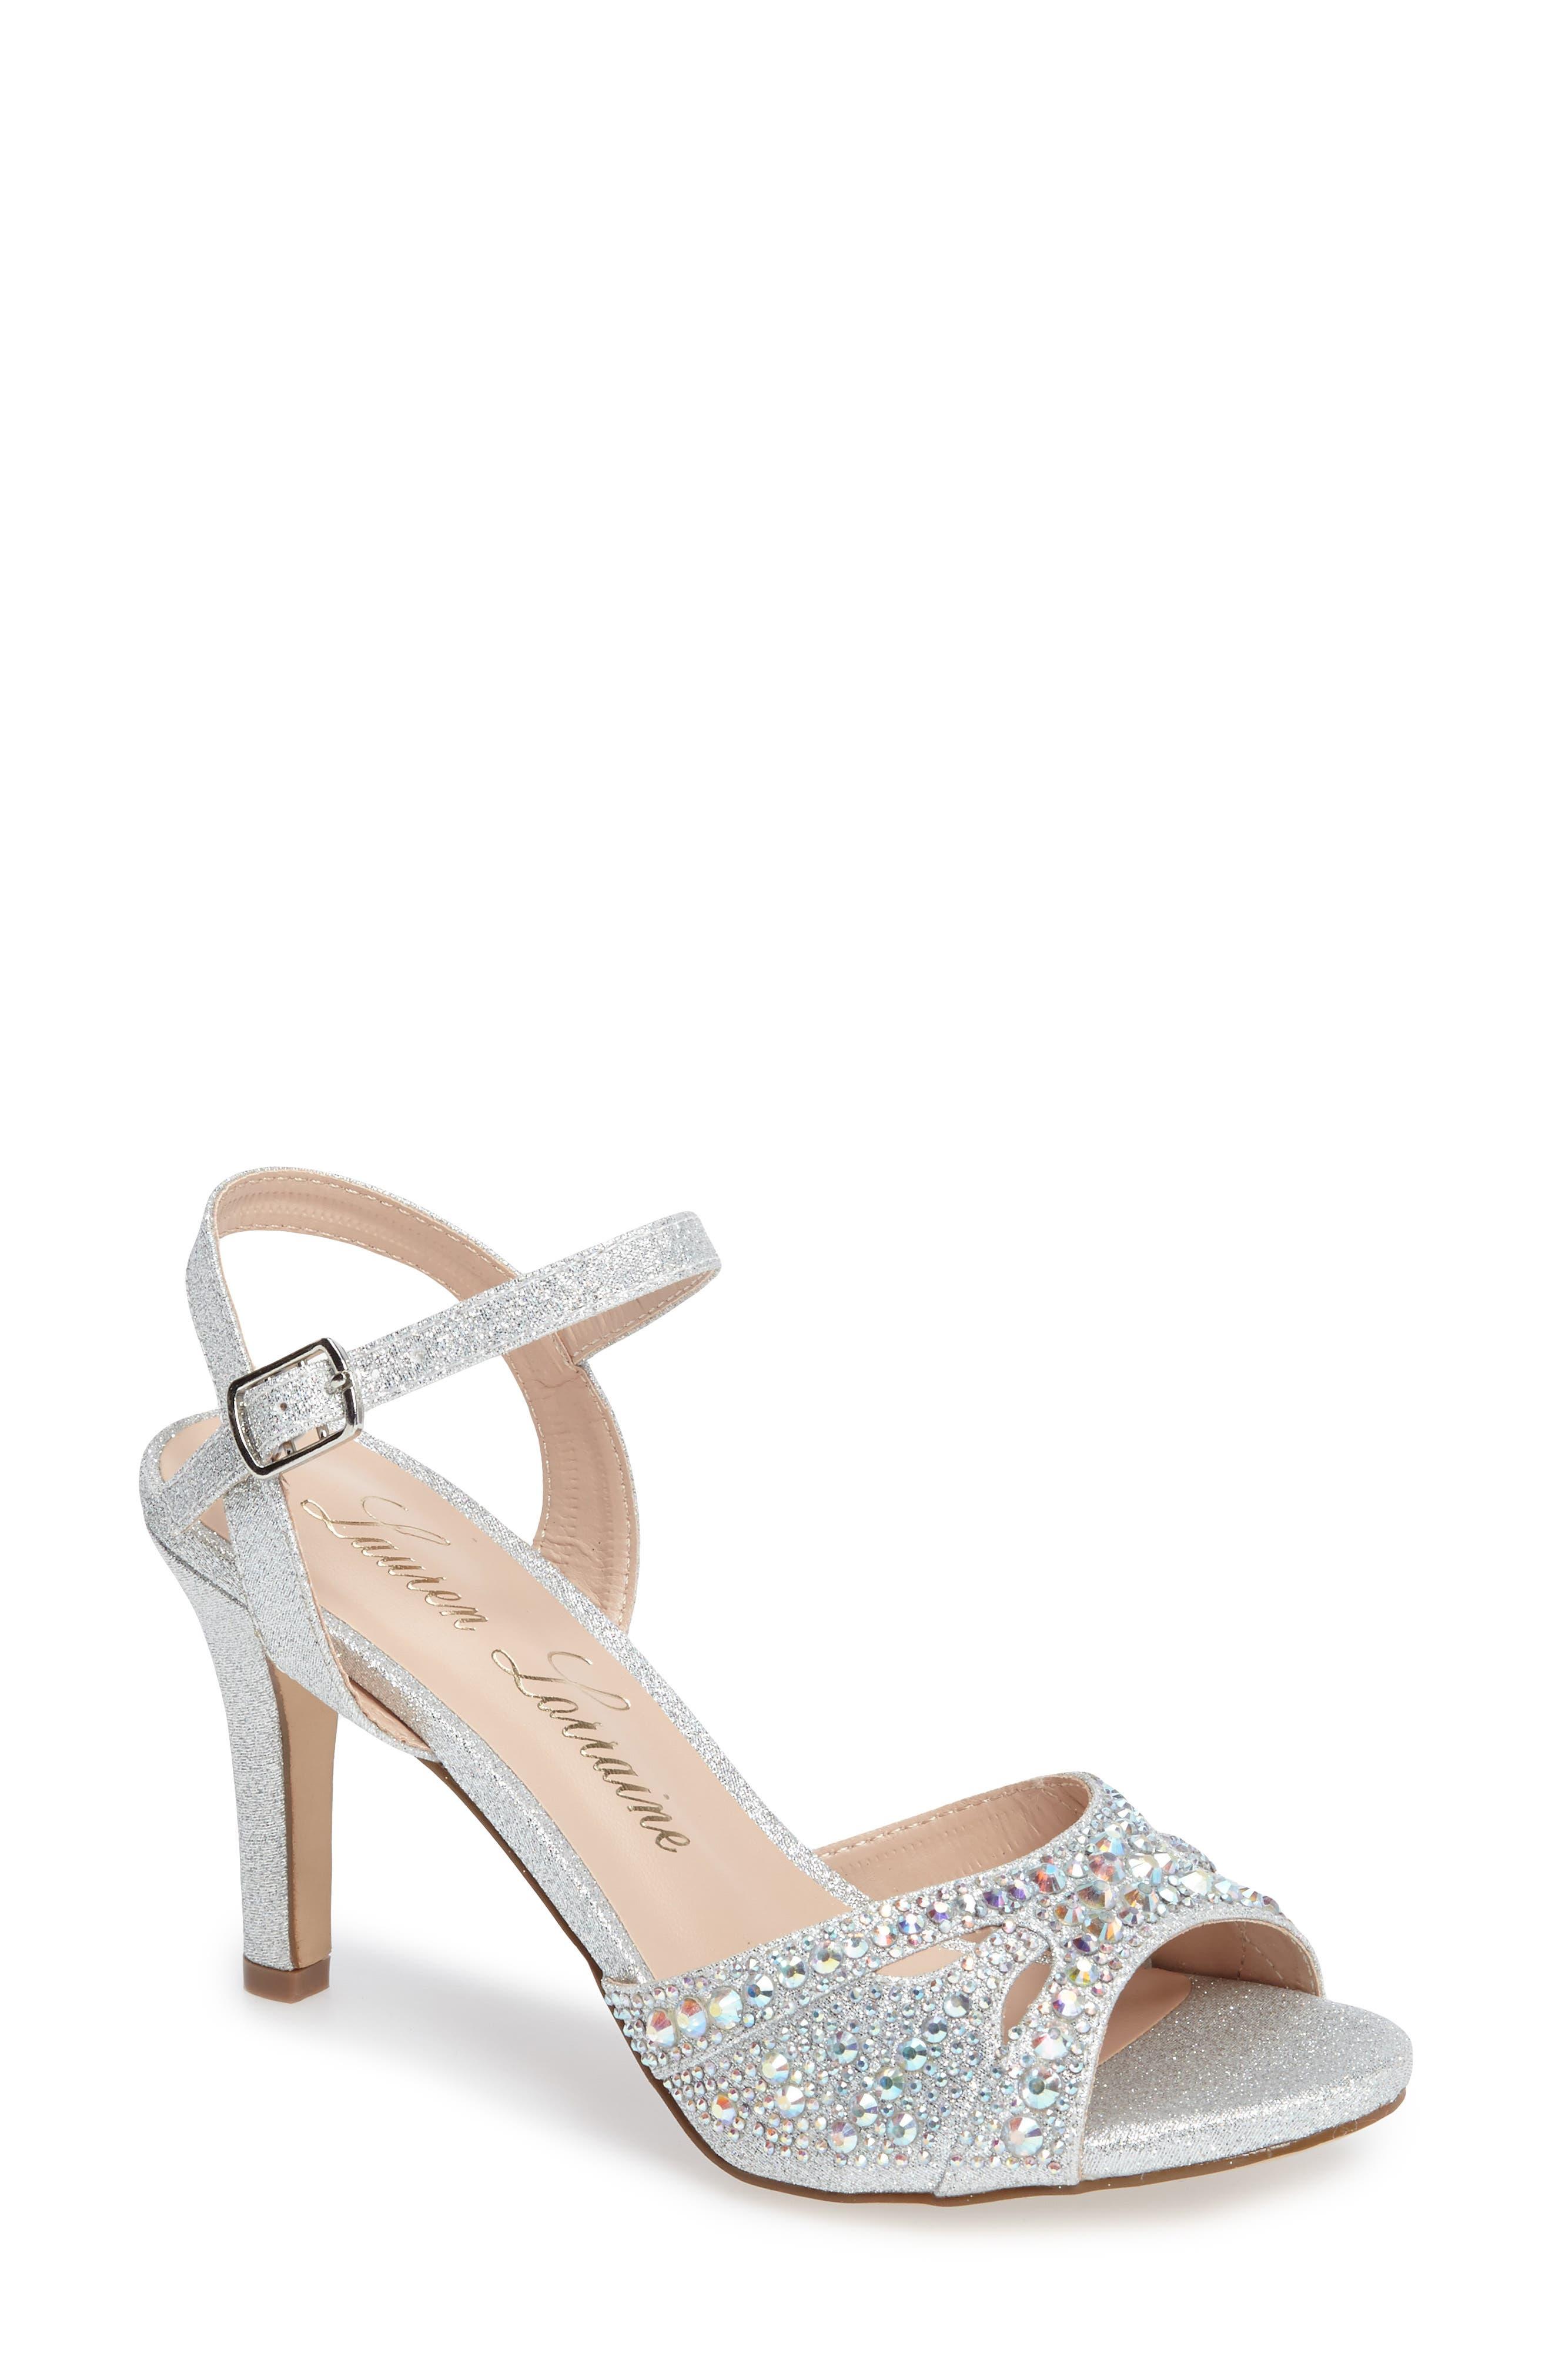 Florence Crystal Embellished Sandal,                             Main thumbnail 1, color,